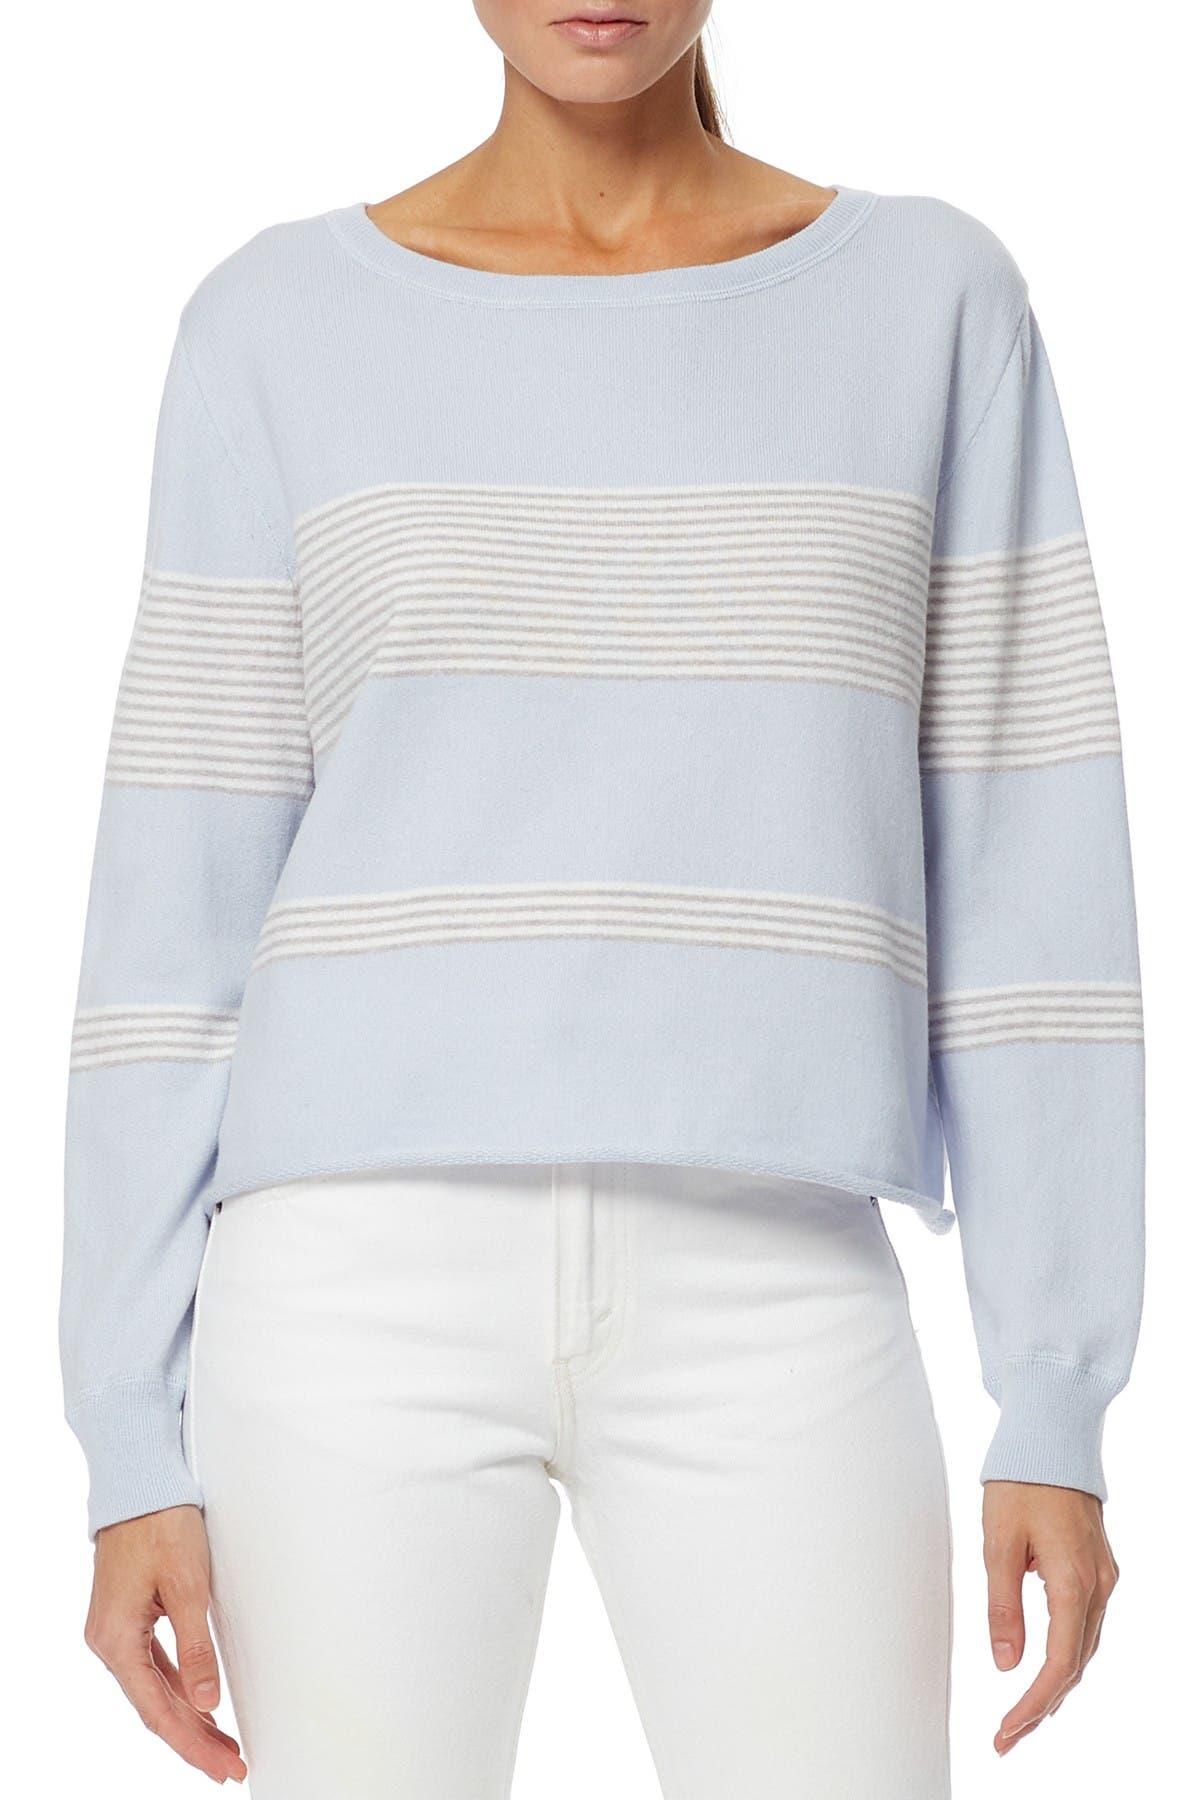 Image of 360 Cashmere Amora Stripe Knit Cotton & Cashmere Blend Sweater